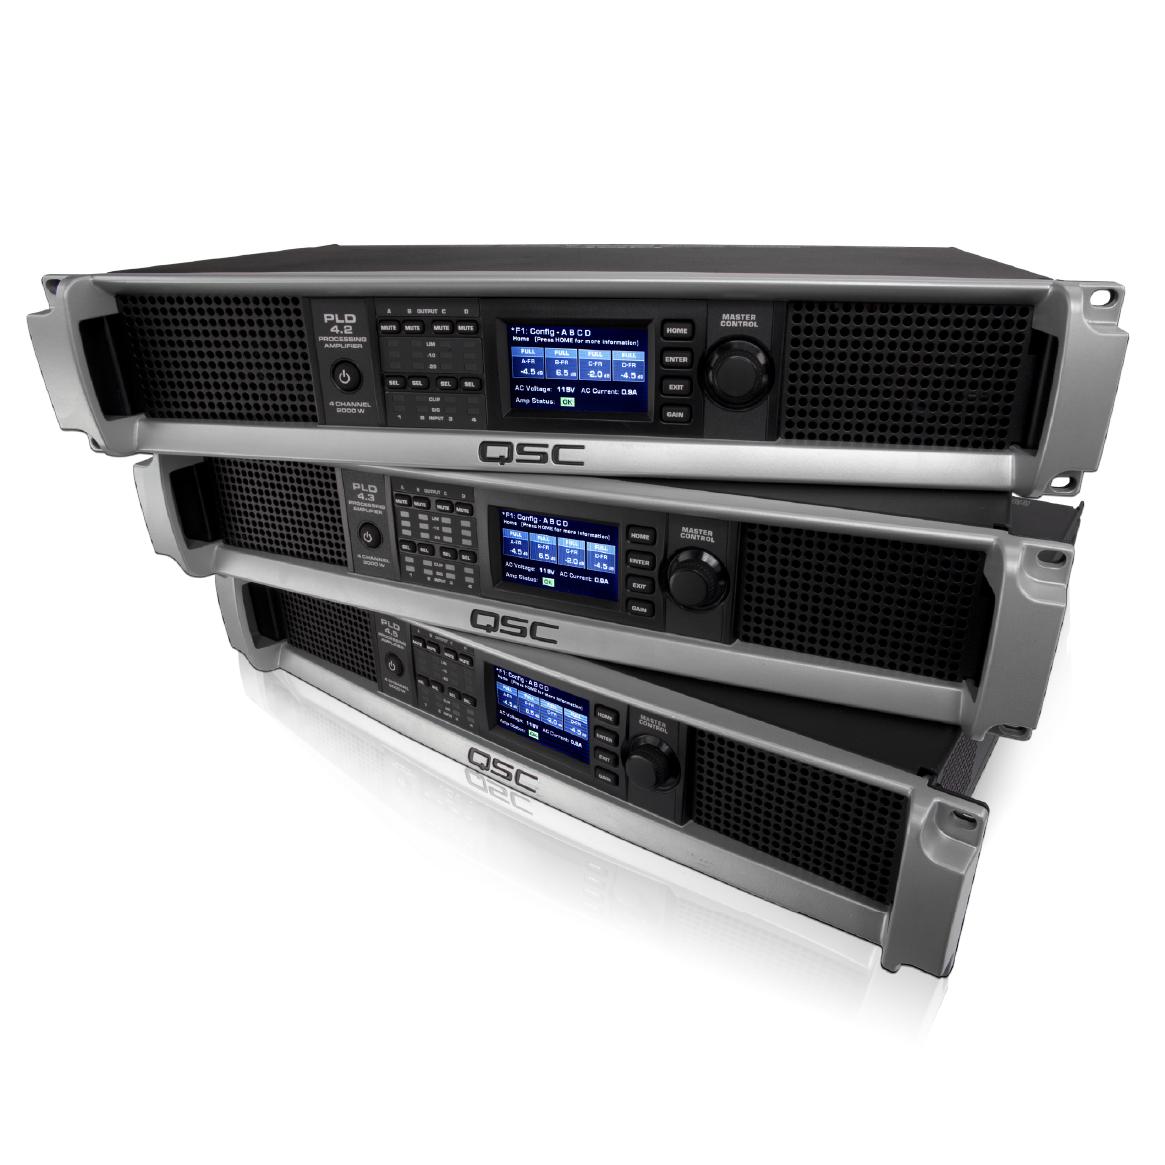 qsc pld 4 3 1400 watt four channel power amplifier musical instruments. Black Bedroom Furniture Sets. Home Design Ideas